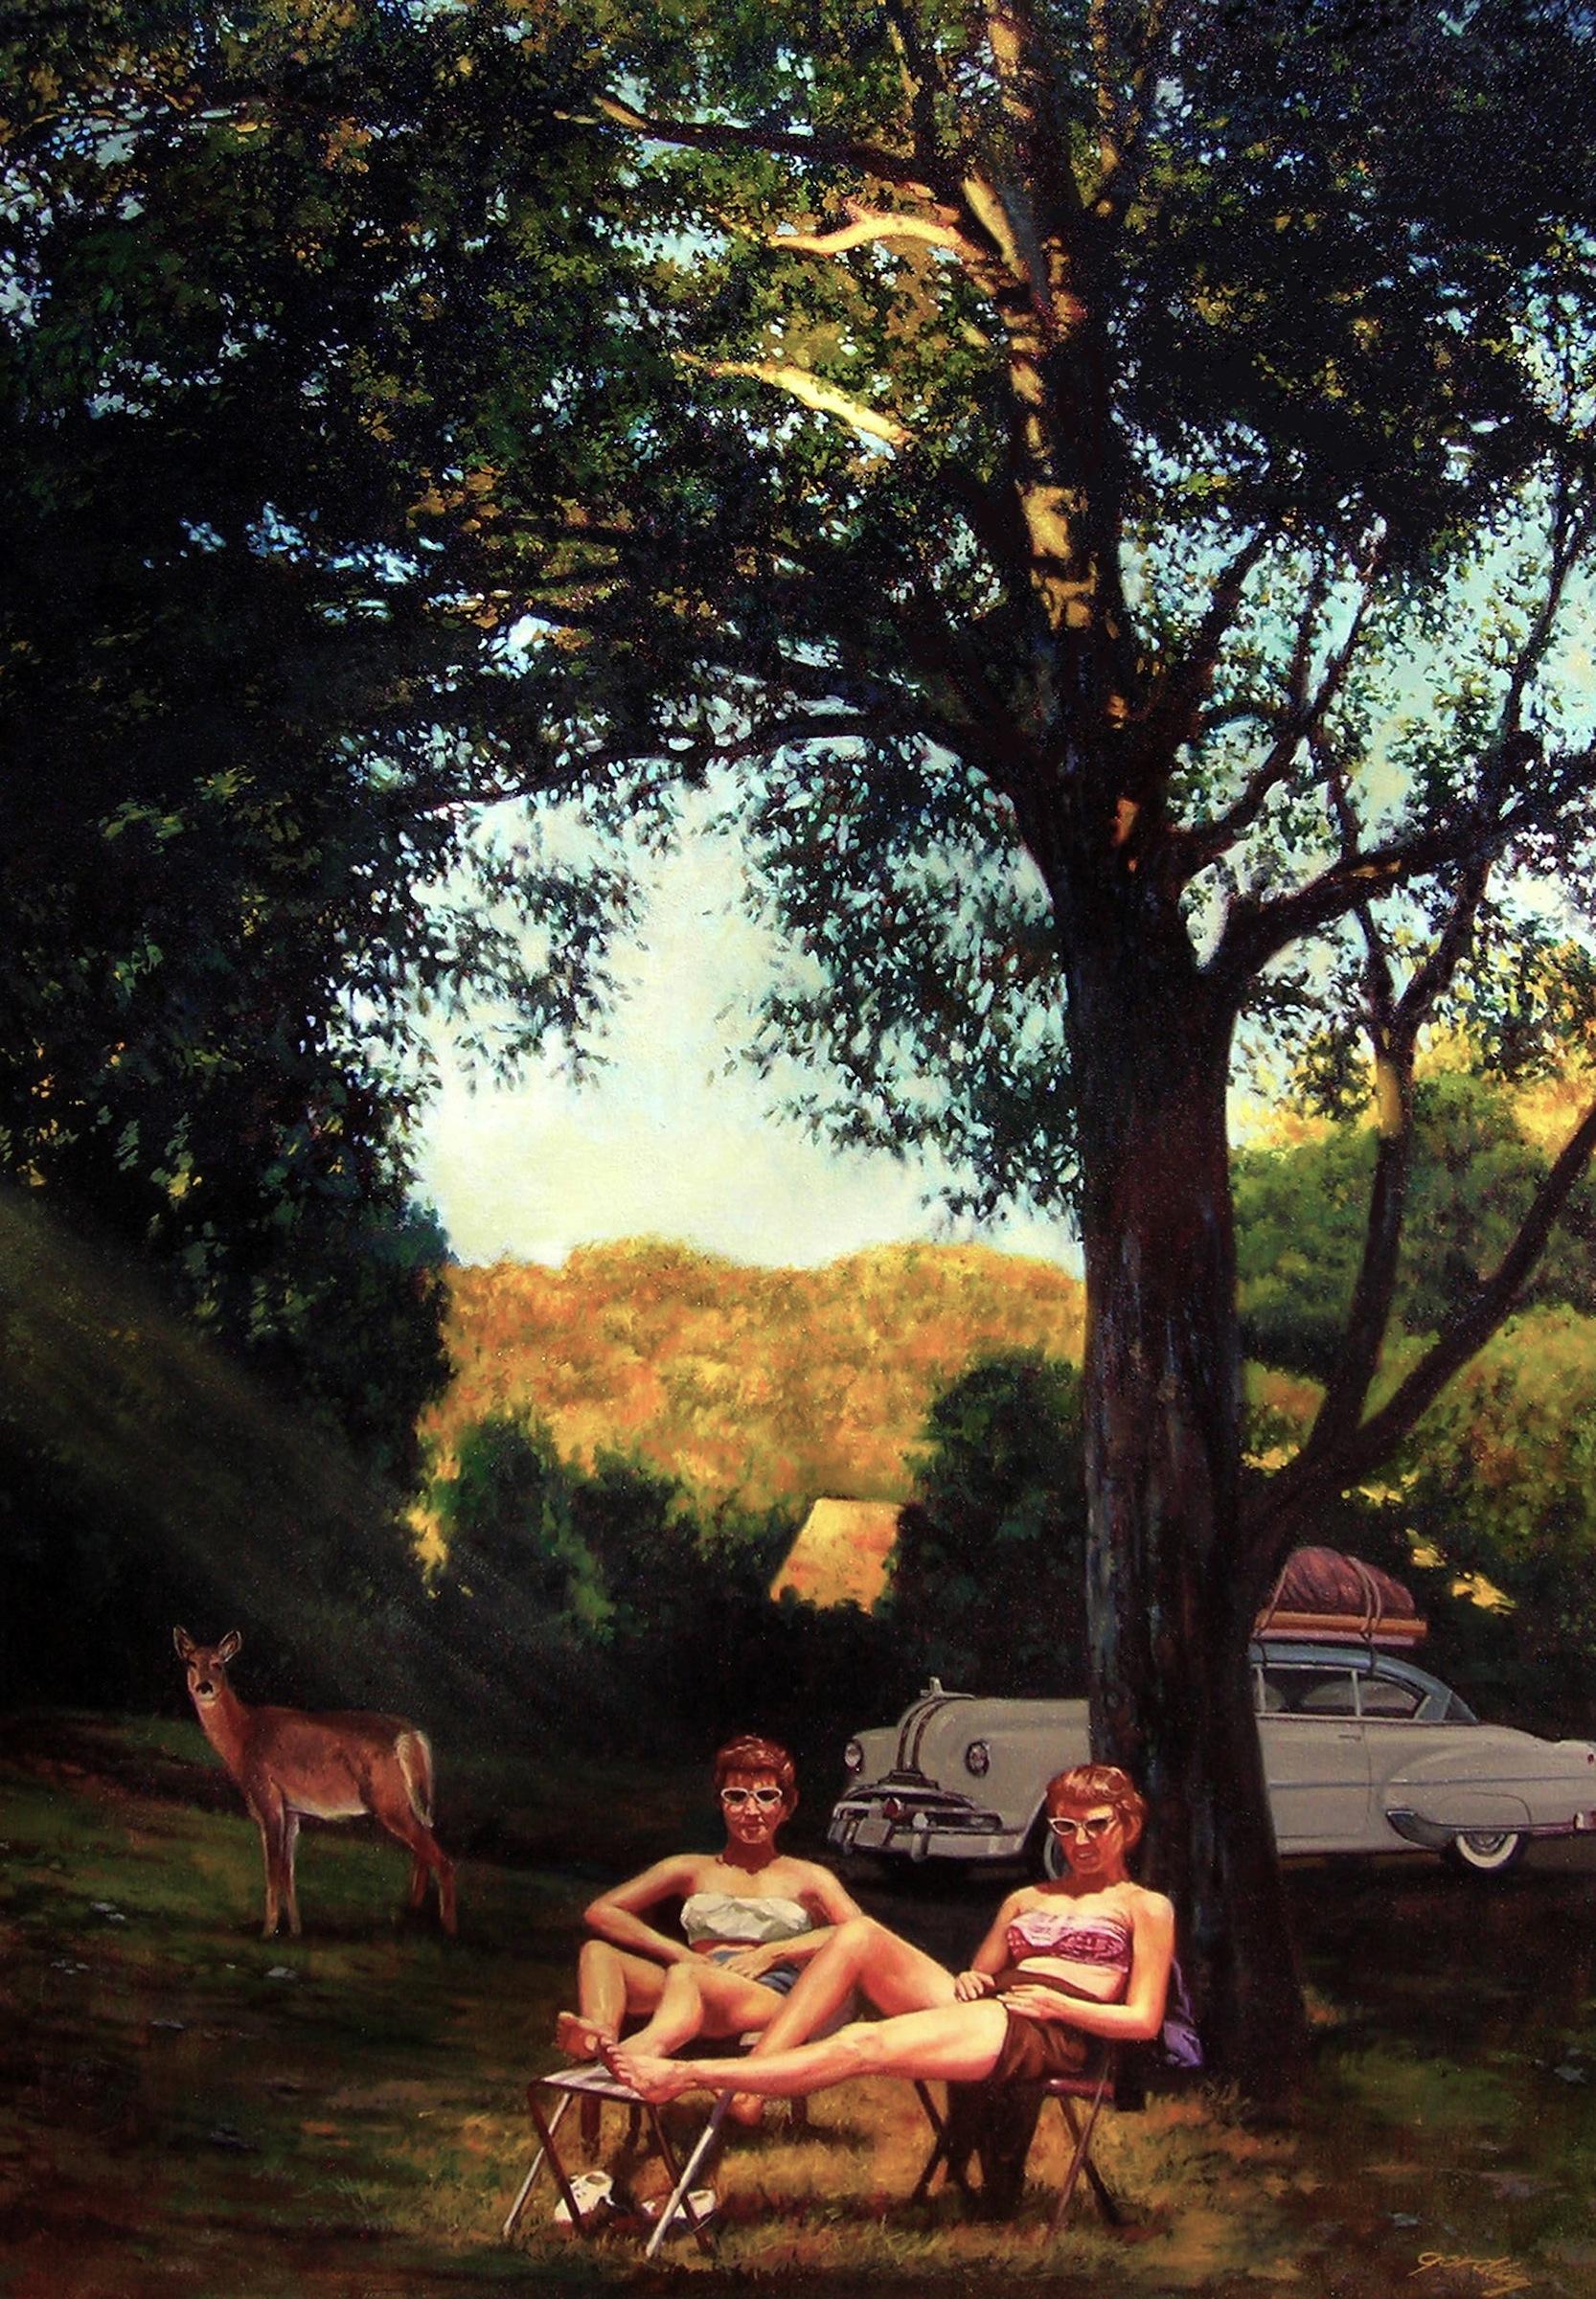 Campsite, 1958, oil on canvas, 36 x 24 in.